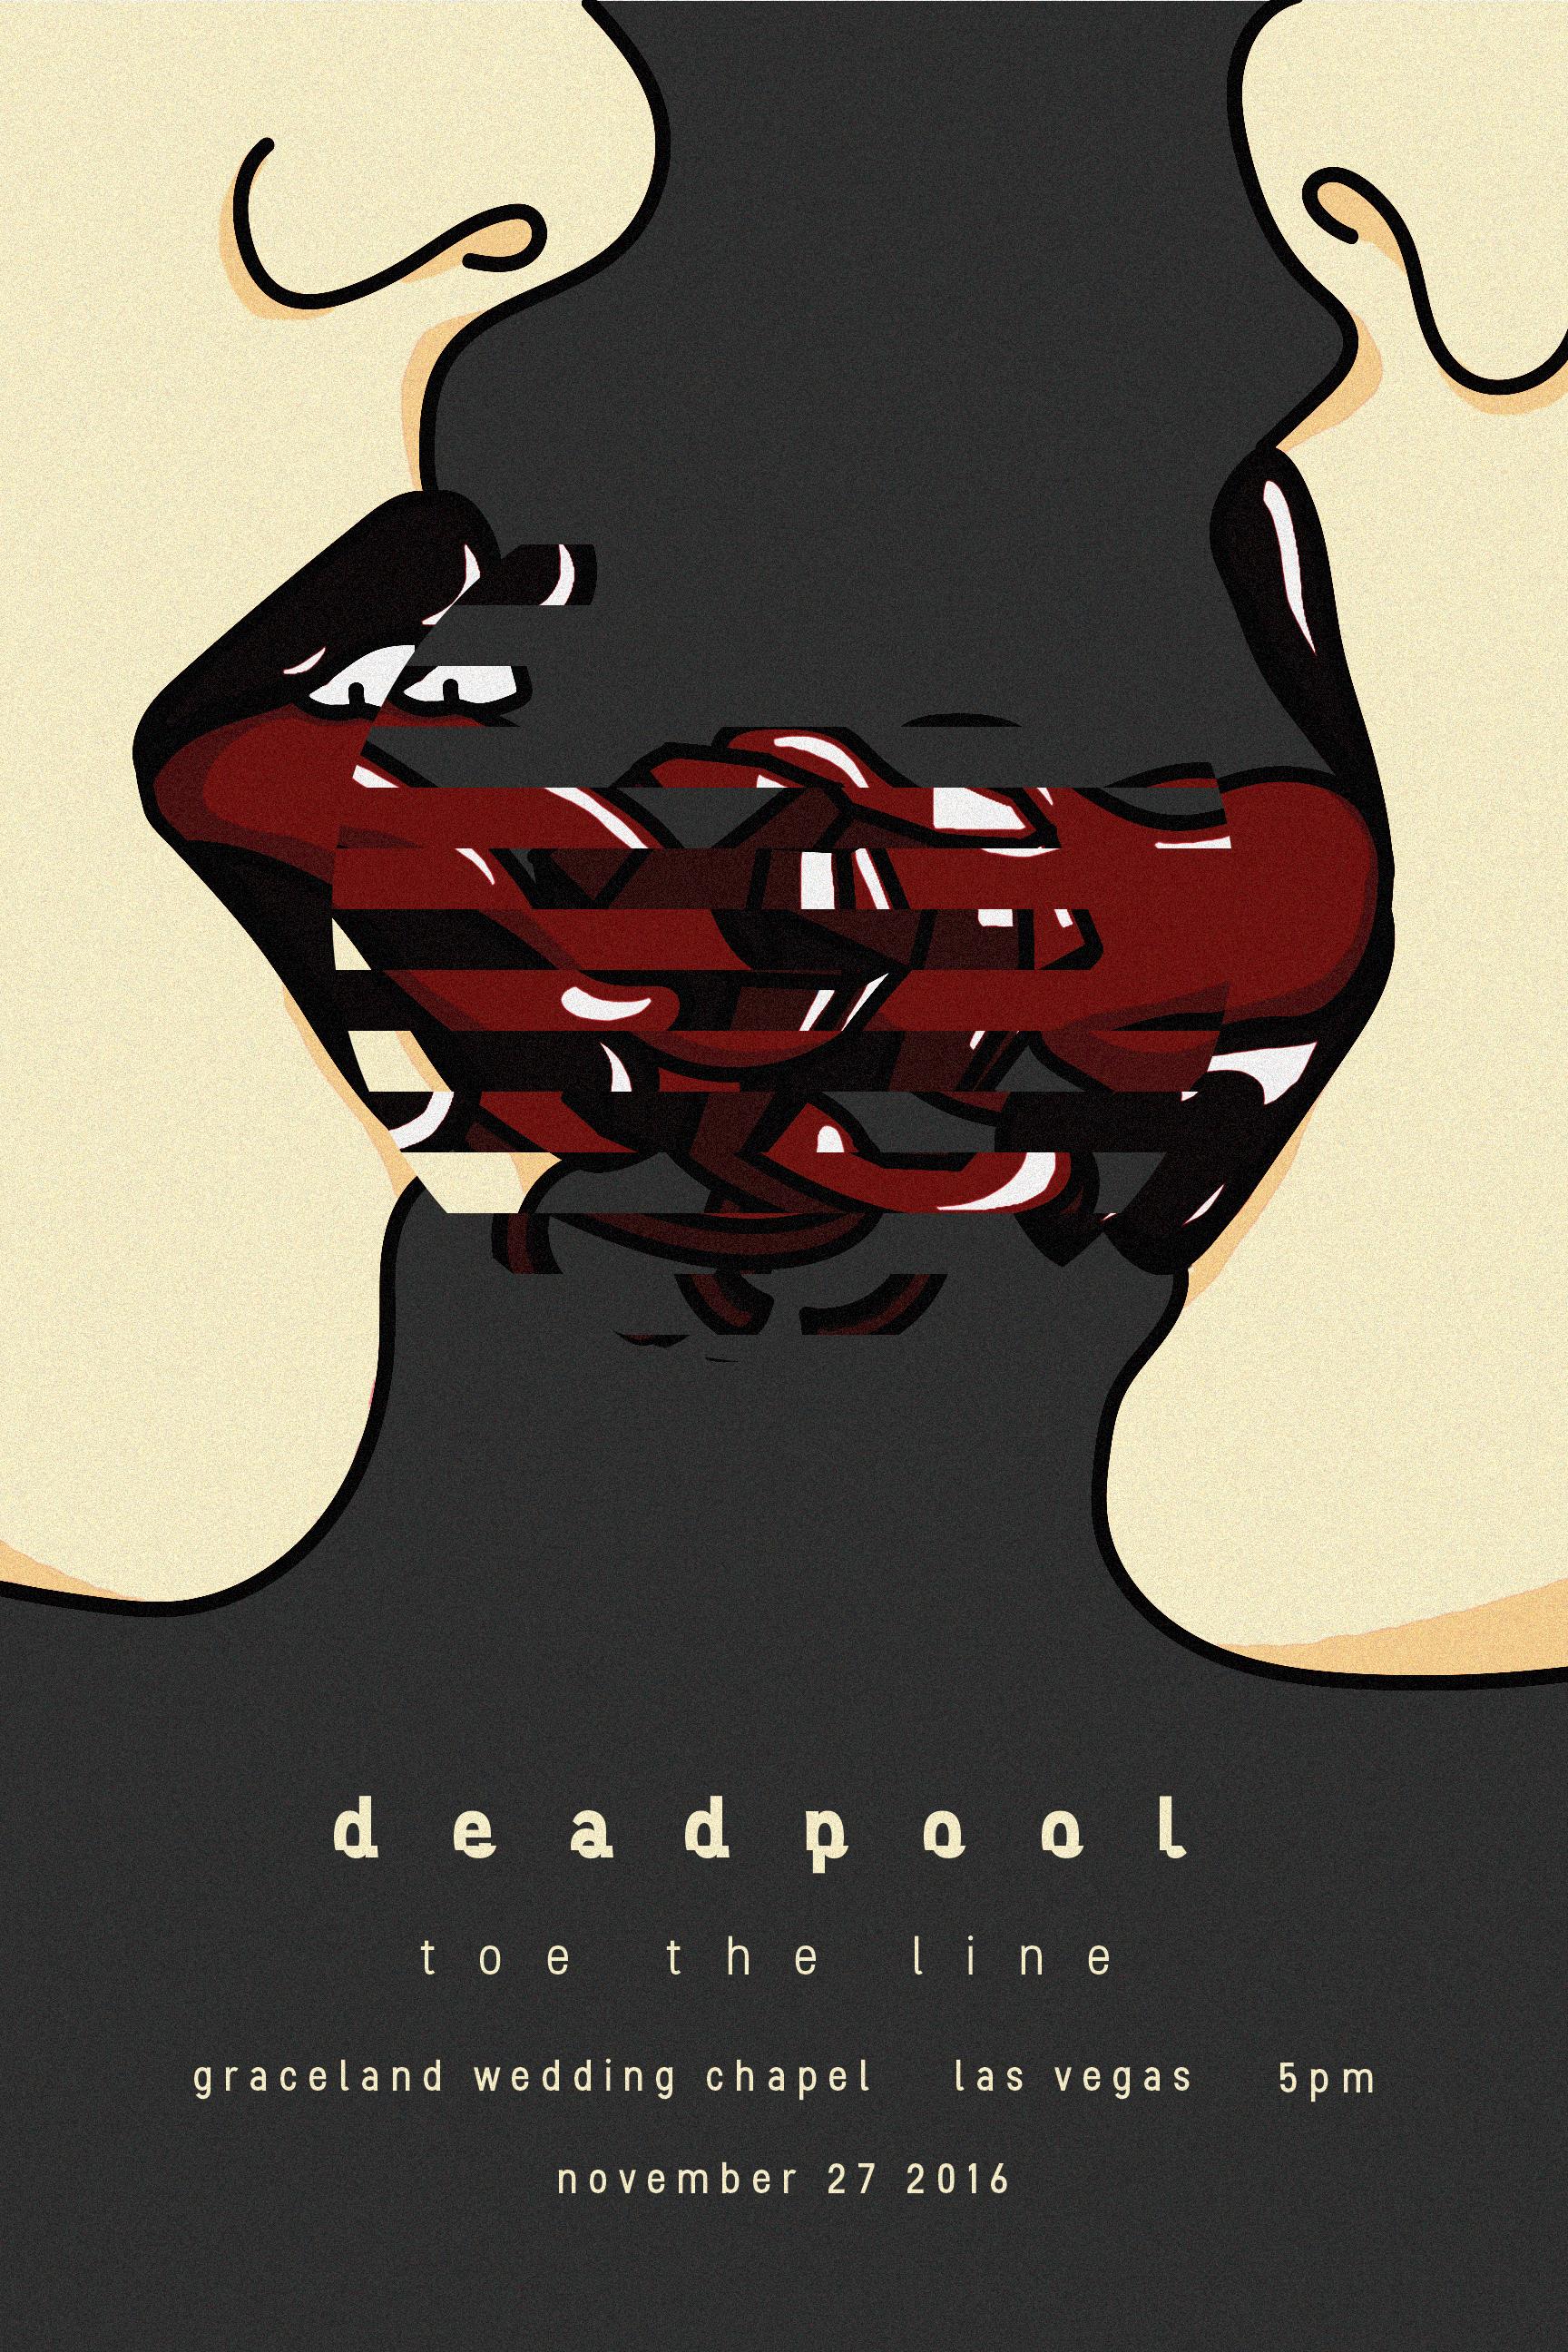 deadpool_01.png